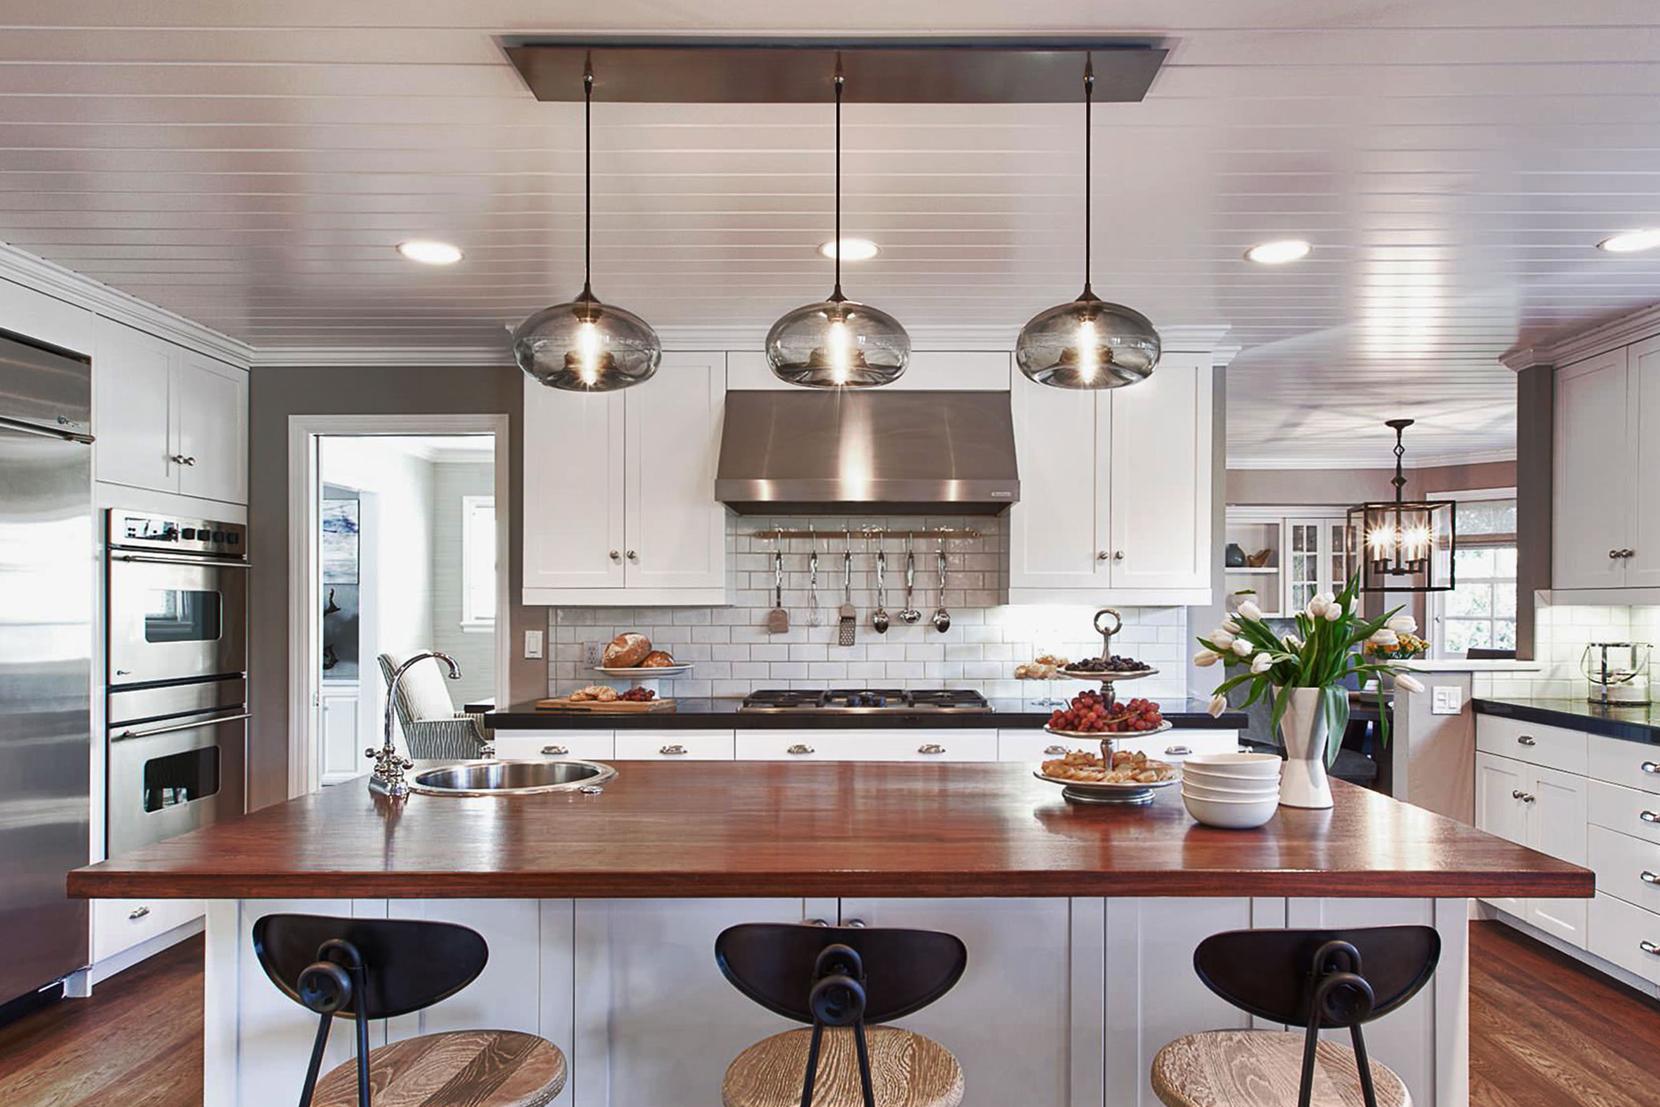 image modern kitchen lighting. + Read More Image Modern Kitchen Lighting D